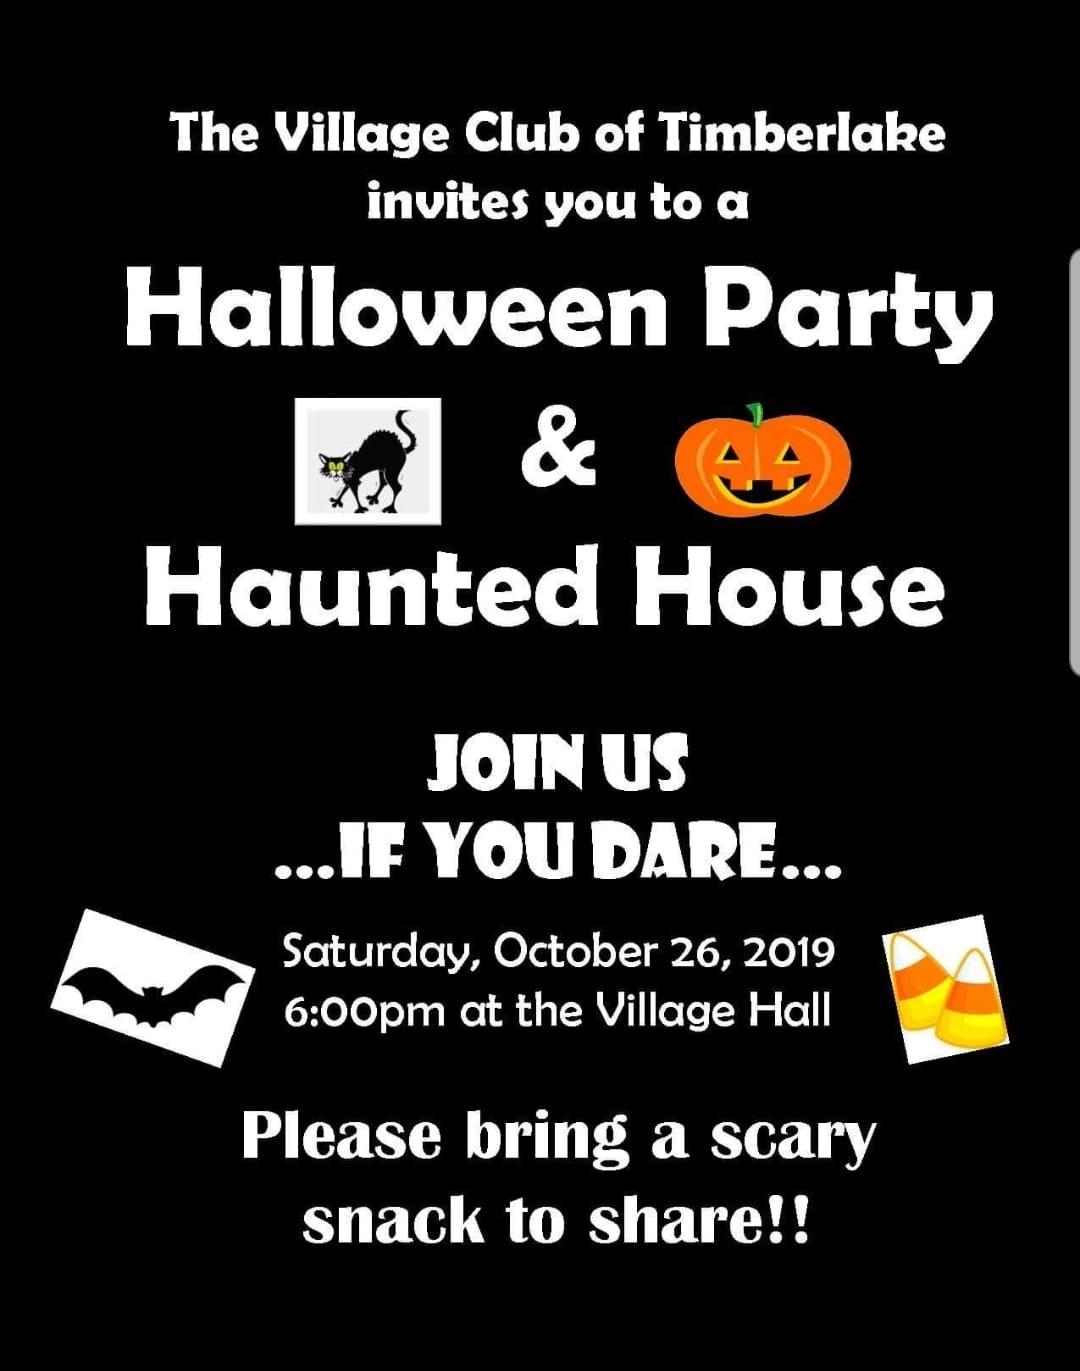 Village of Timberlake Halloween party